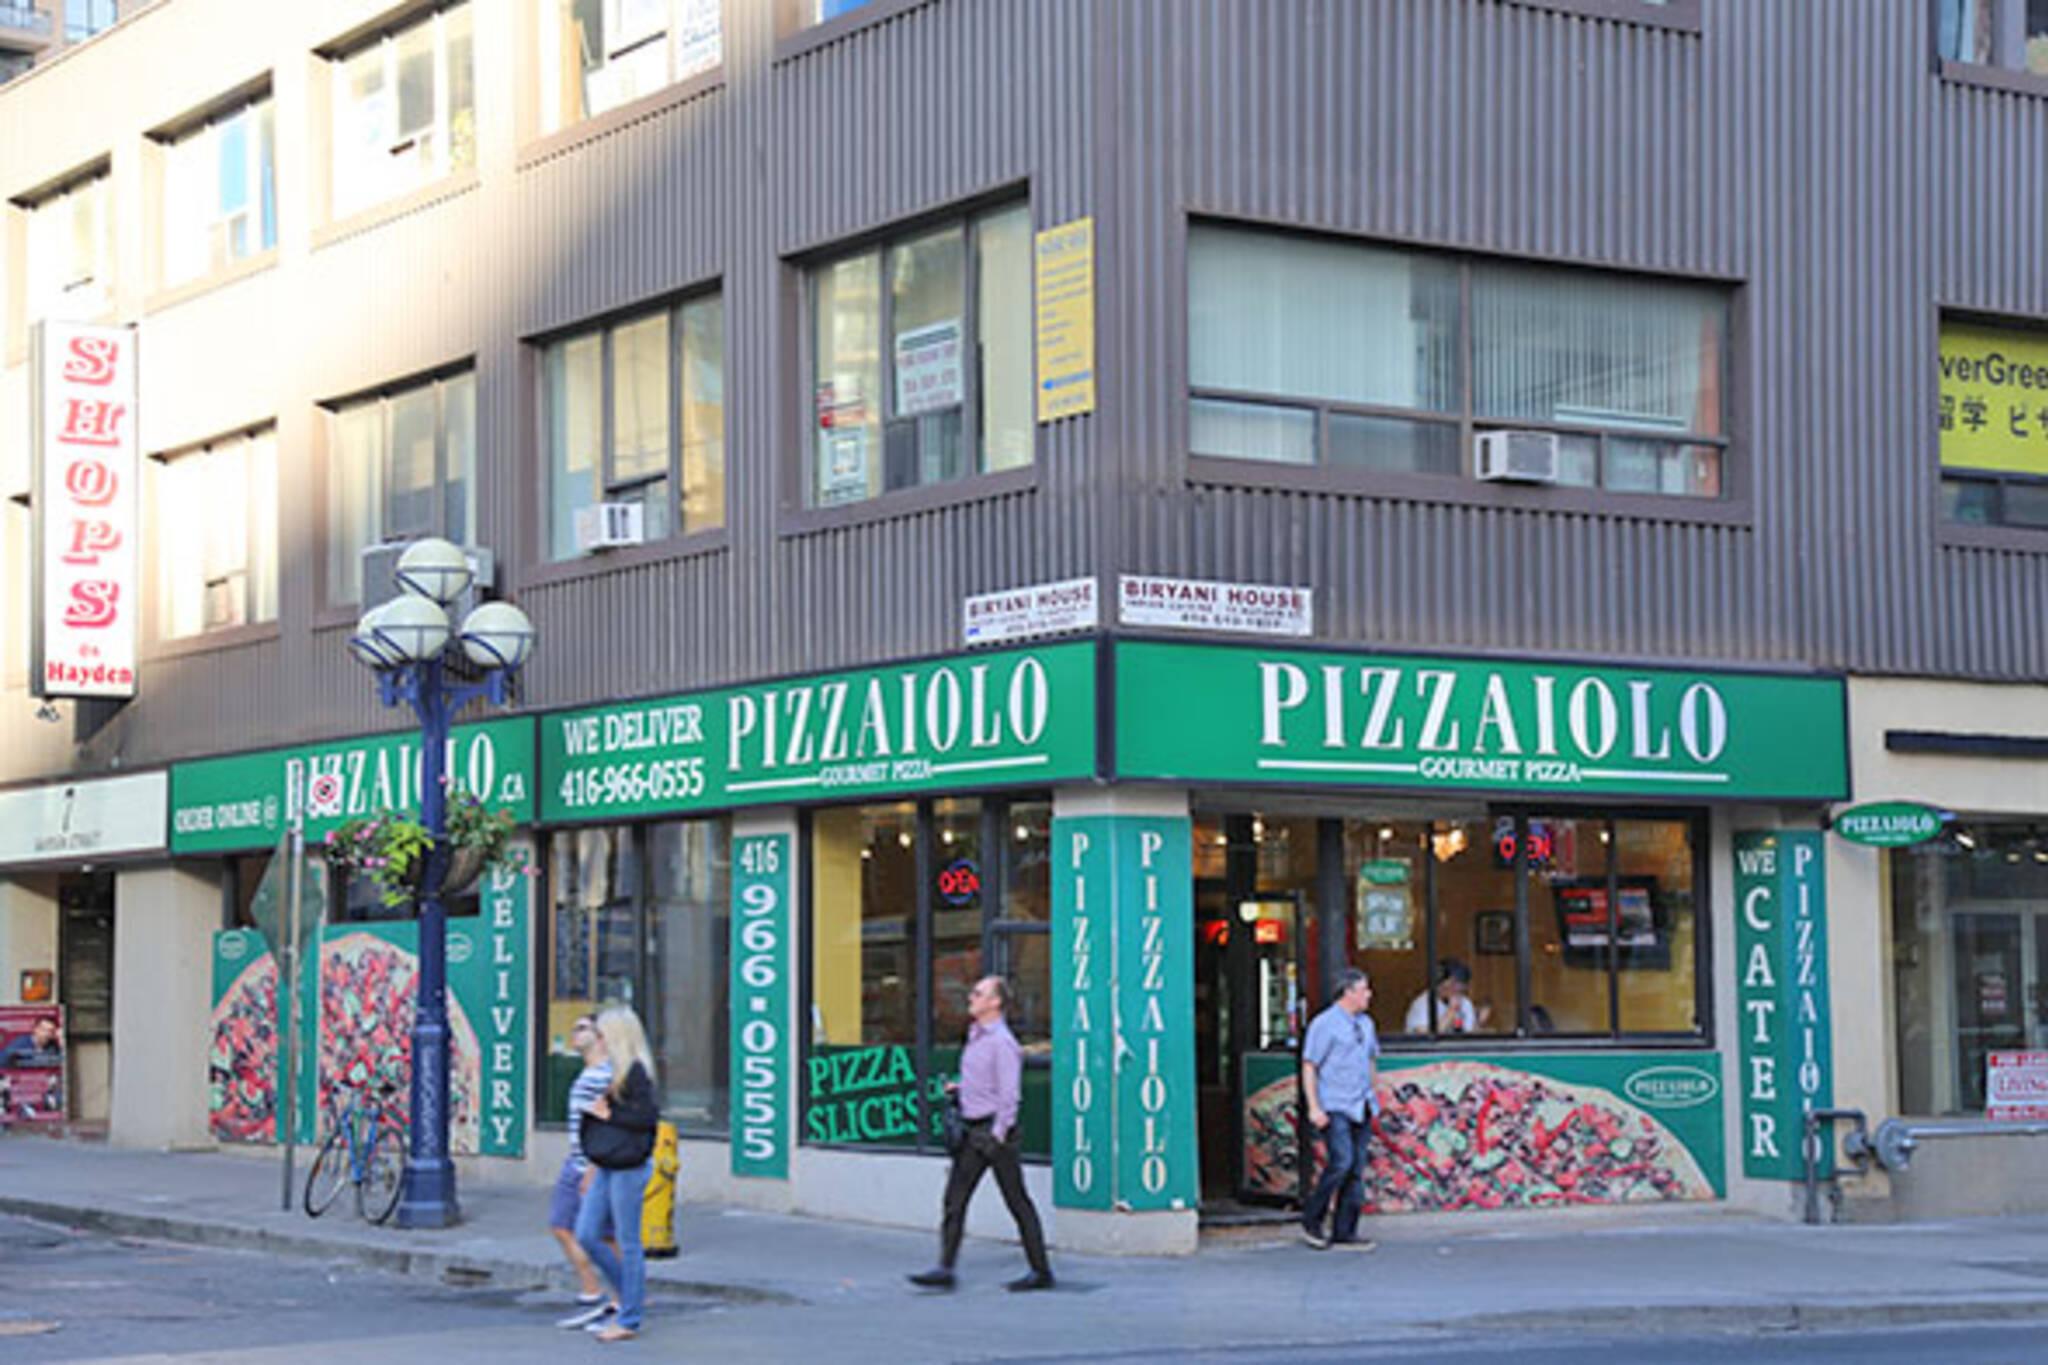 Pizzaolo Hayden